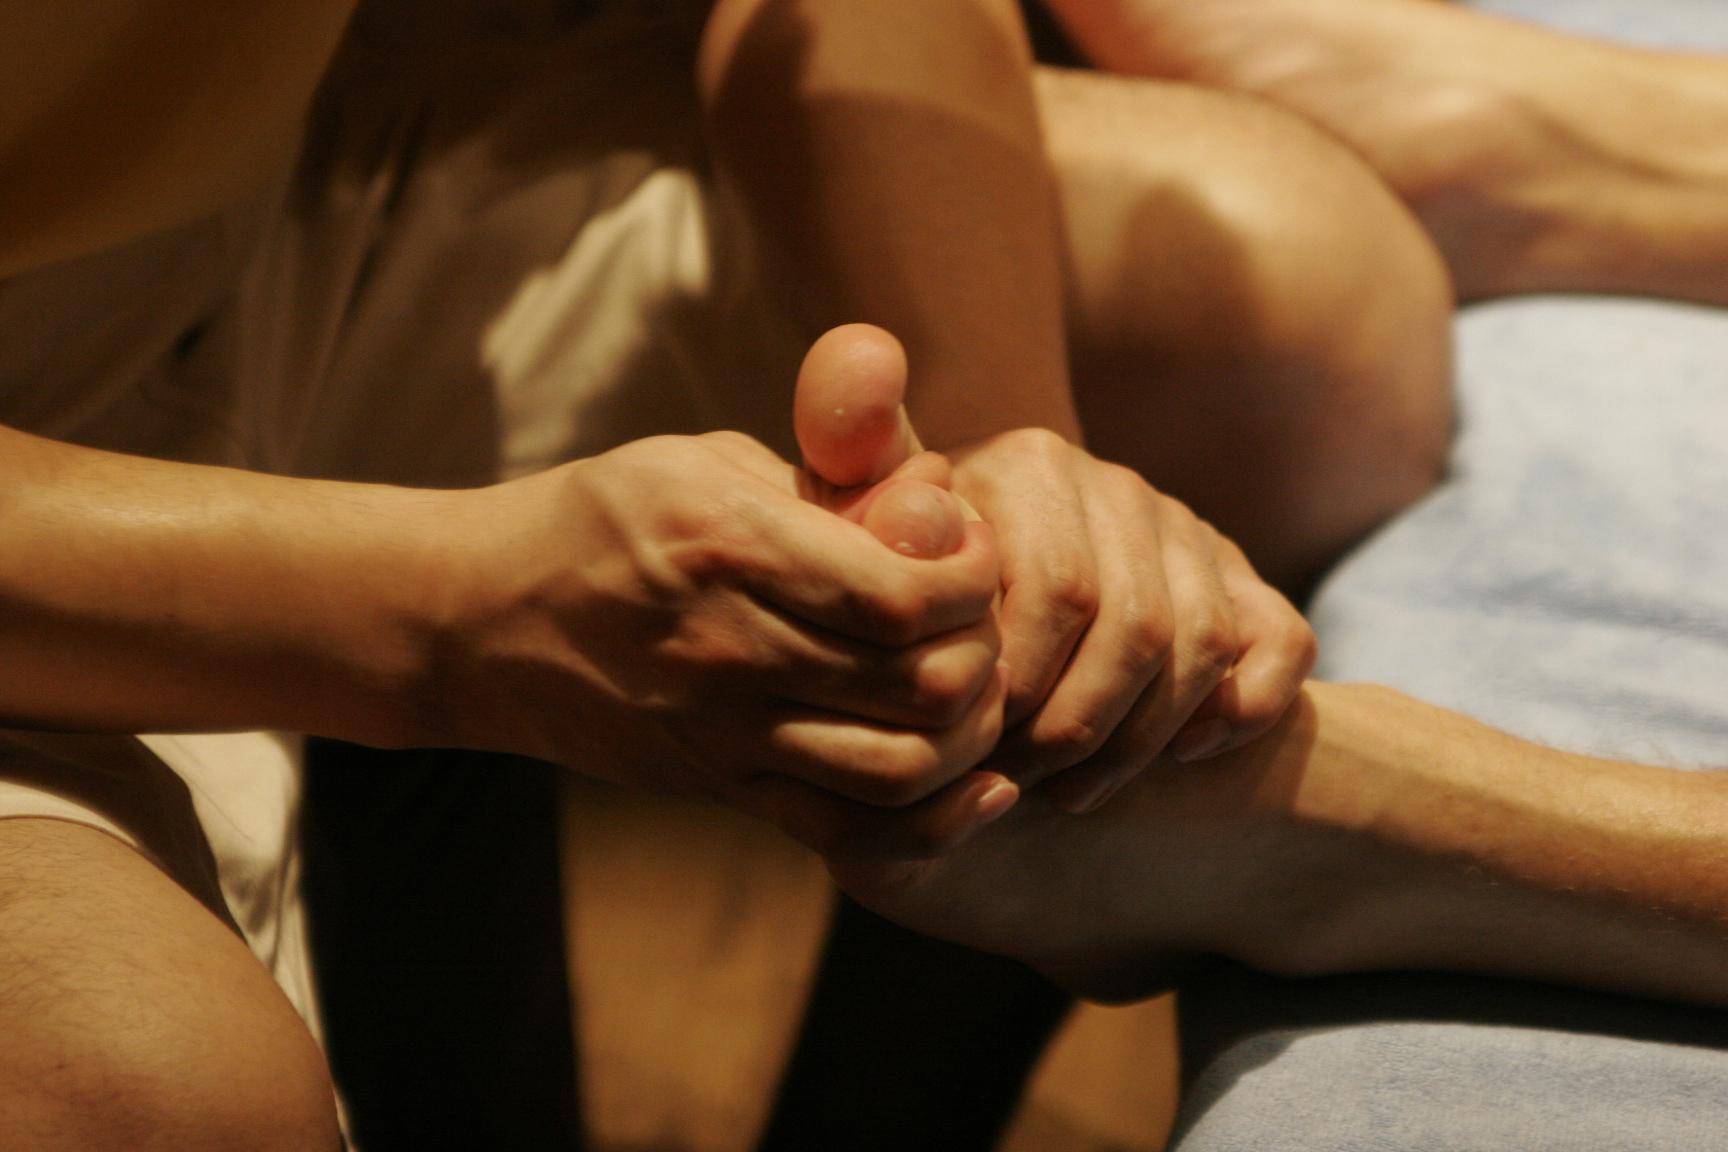 massaggi completi vicenza gay feet master